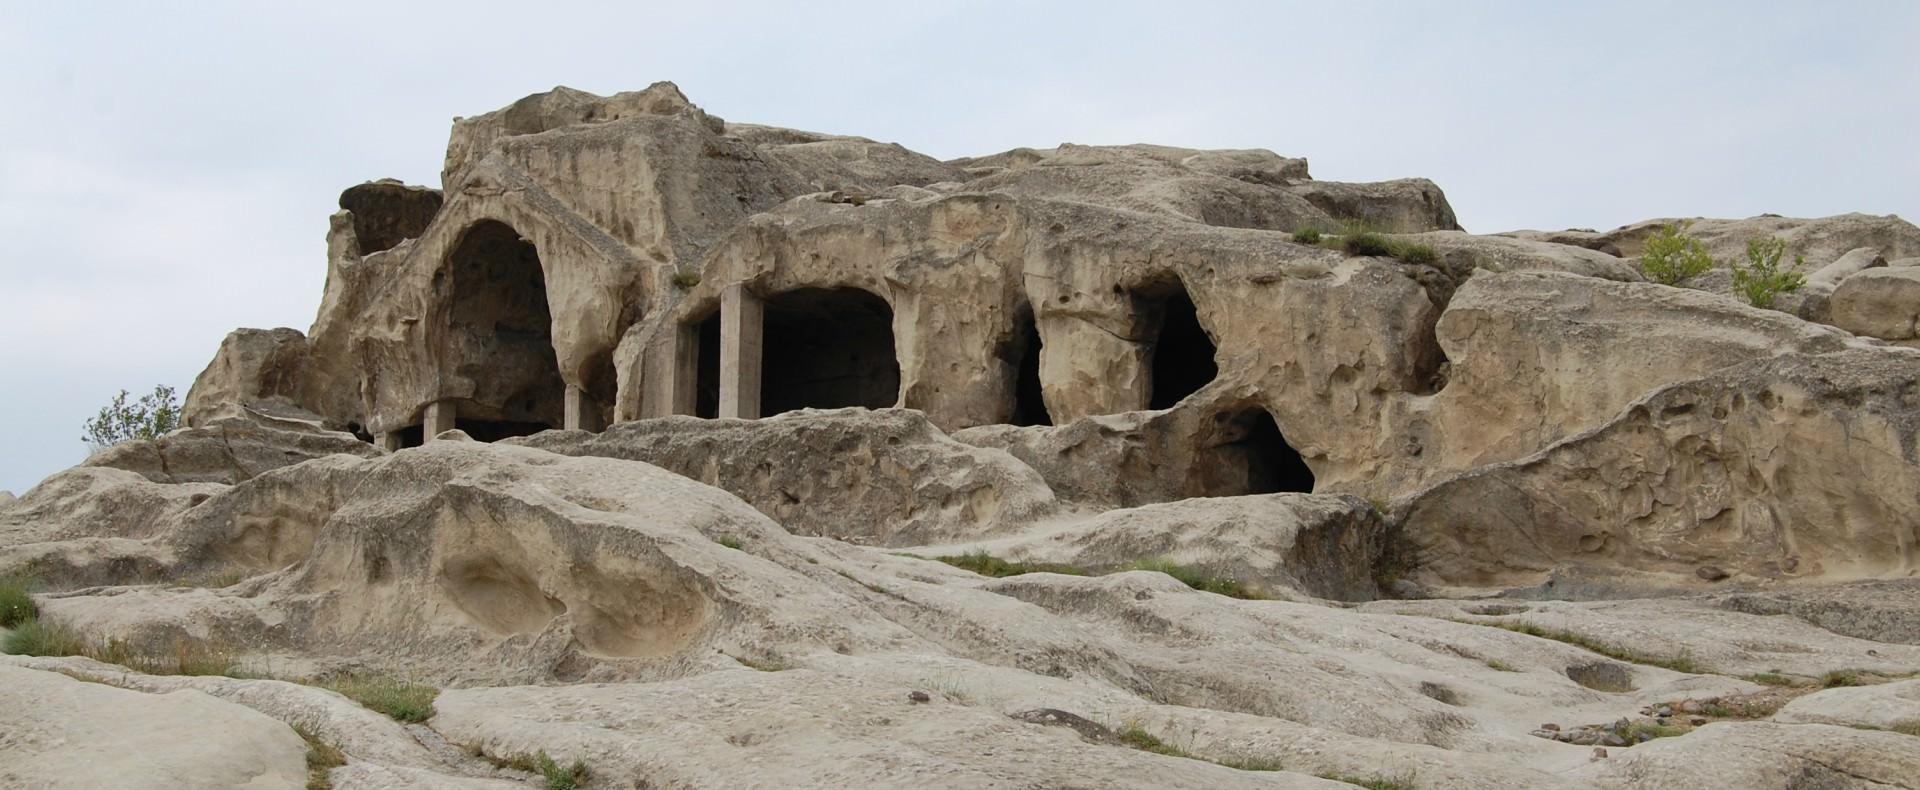 Uplistsikhe Cave complex, Georgia